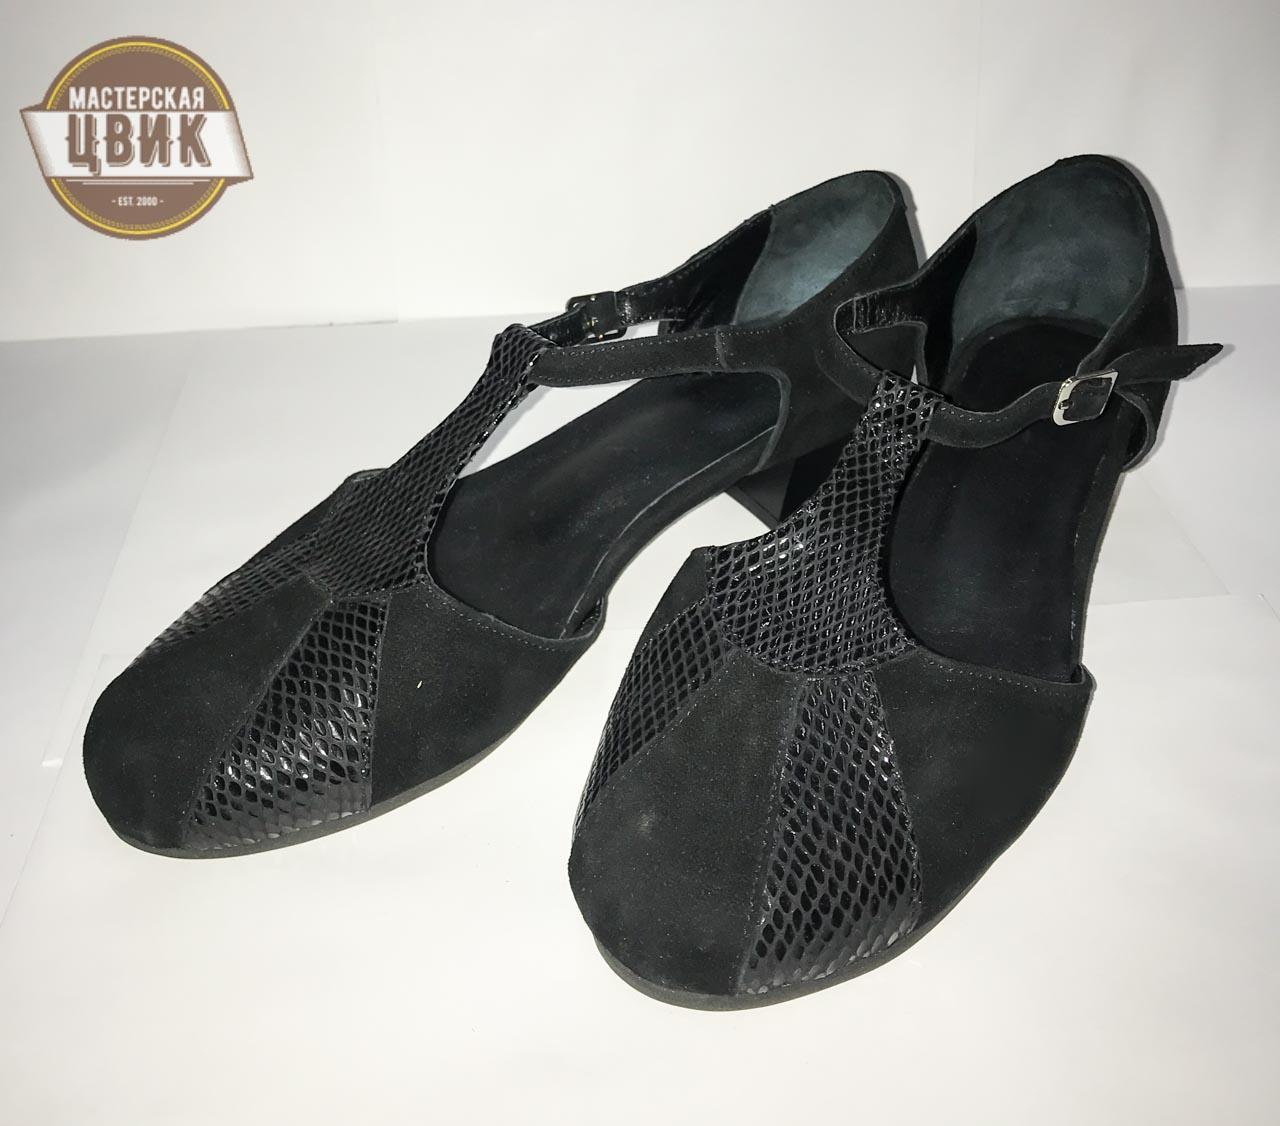 individualnyj-poshiv-obuvi-minsk-17 Индивидуальный пошив обуви